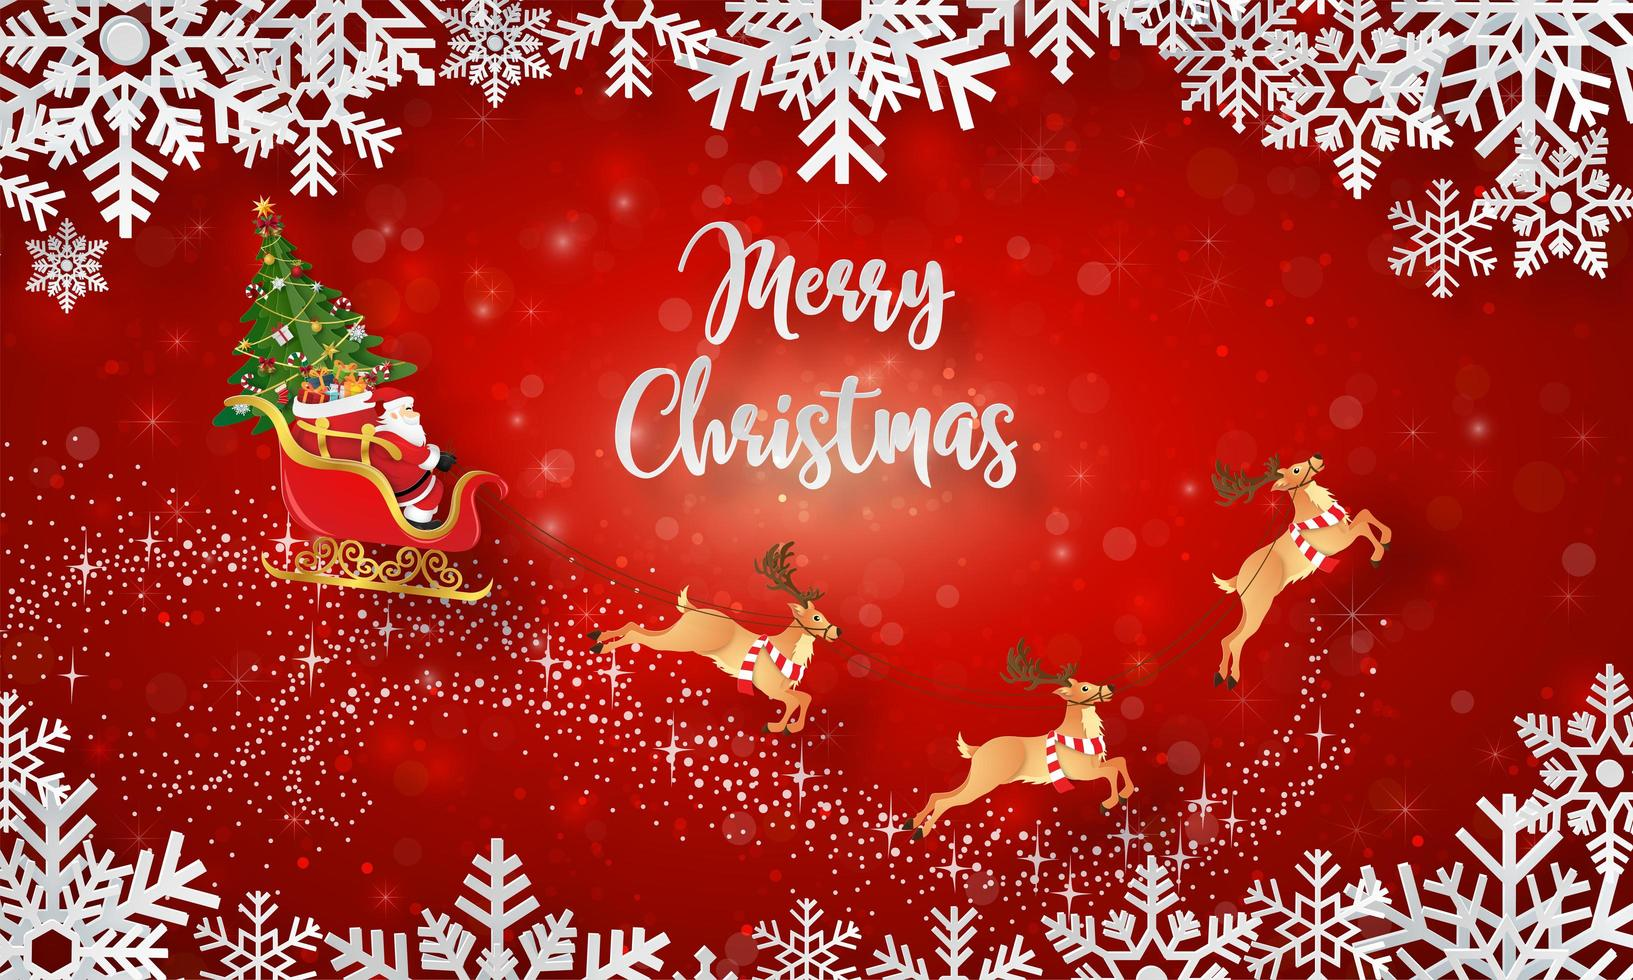 Santa Claus on a sleigh with Christmas tree on Christmas postcard banner vector